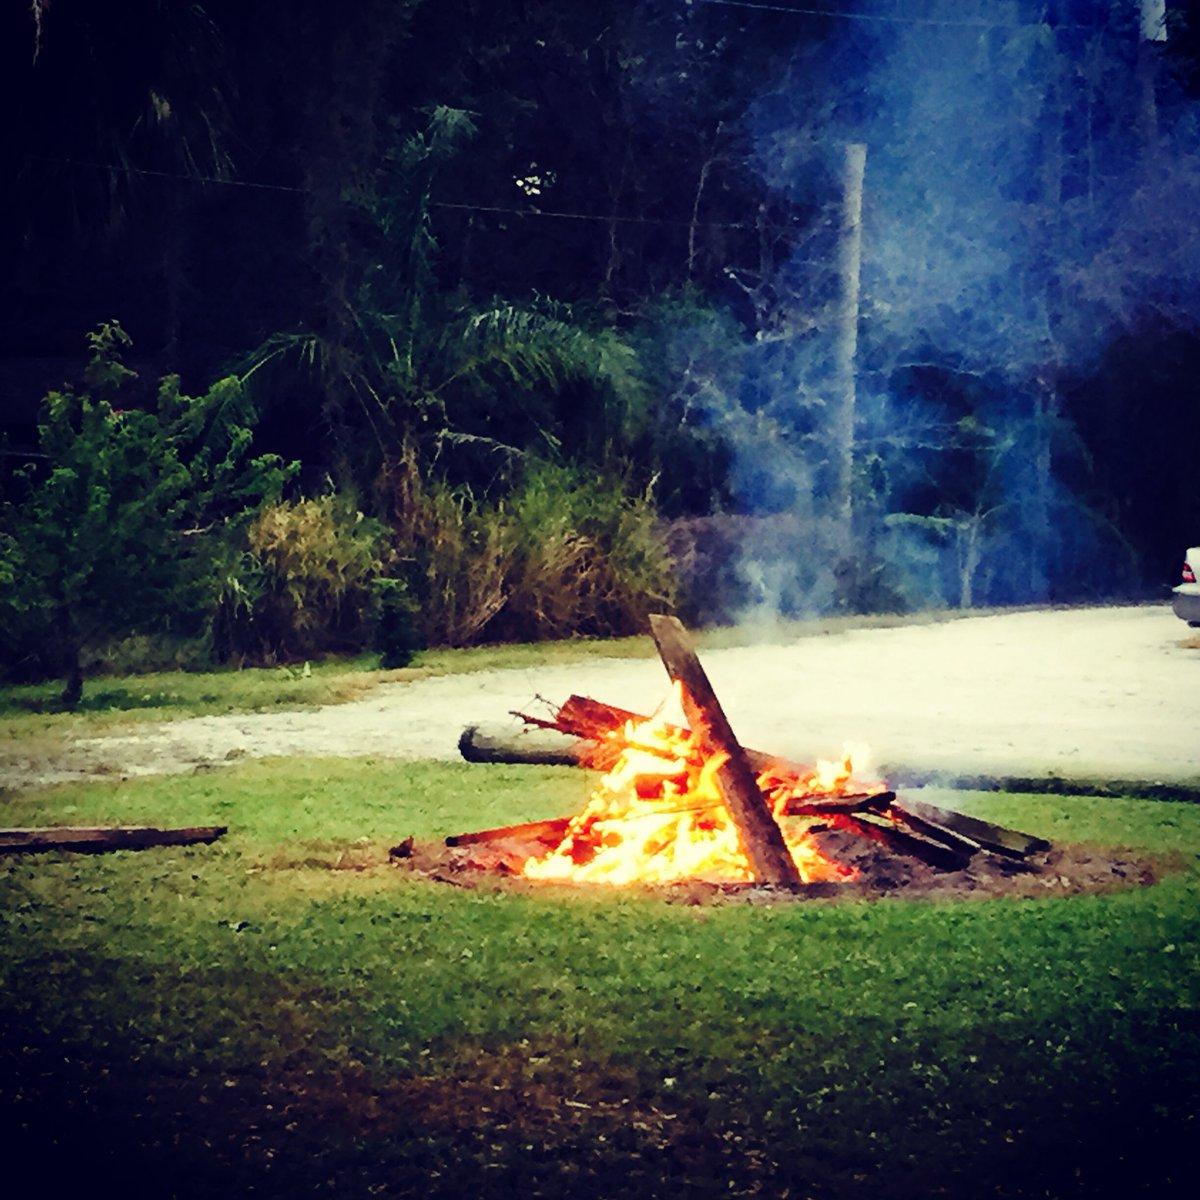 #Bon Fires#SWFL#Marsh mellows#Hot dogs#Smores# <br>http://pic.twitter.com/OTN5VLTq1m